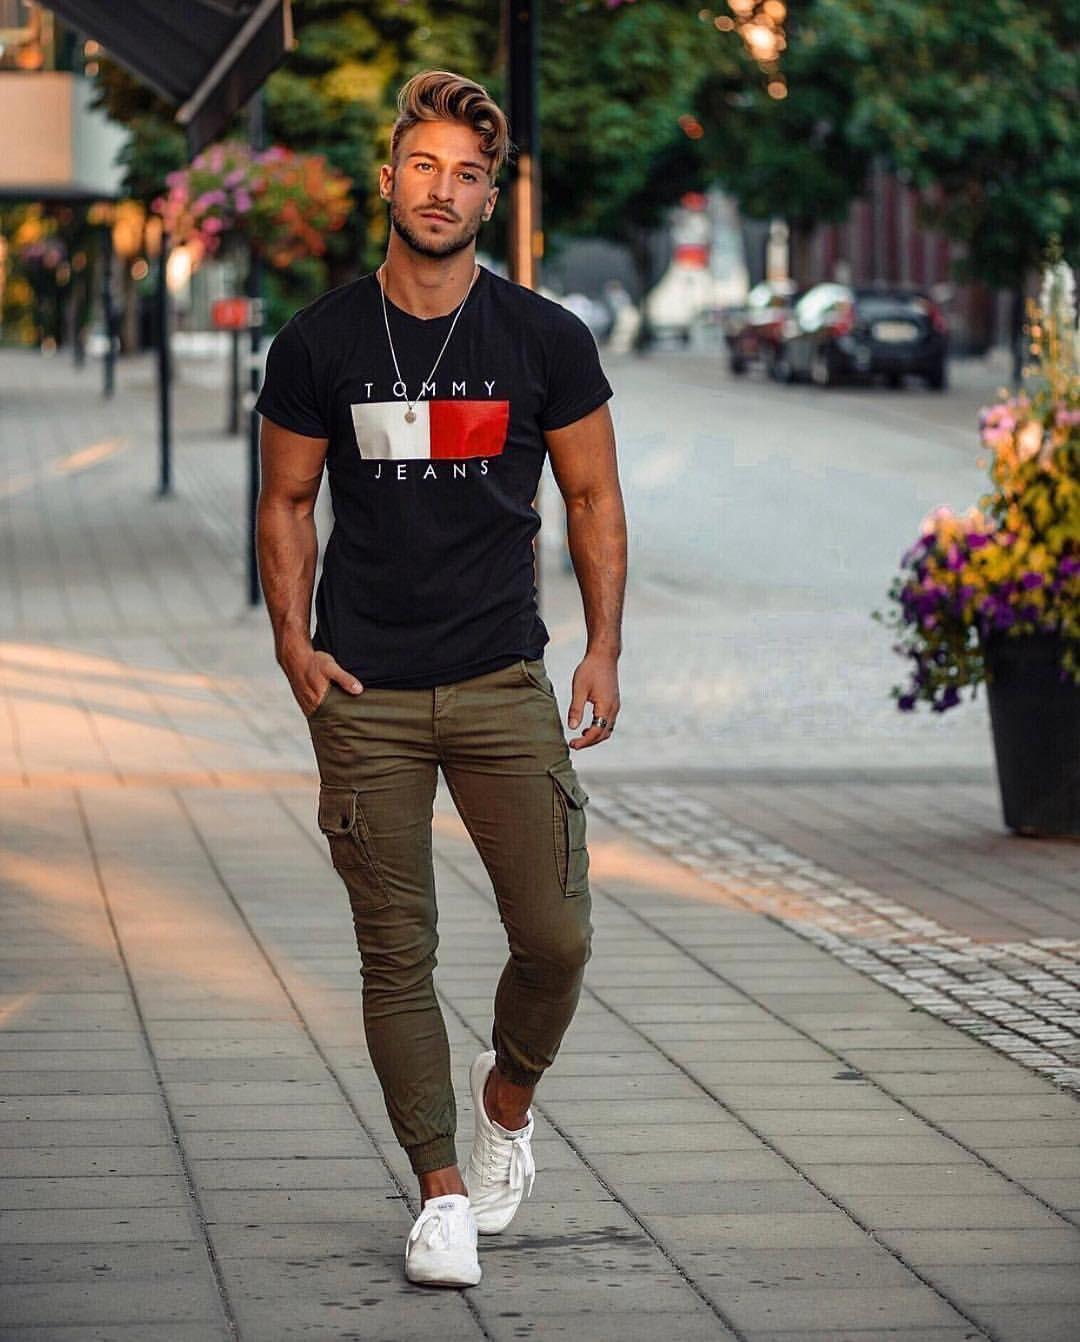 12+Best Men's Street Style - Fashion Looks 2019 #mensstyle